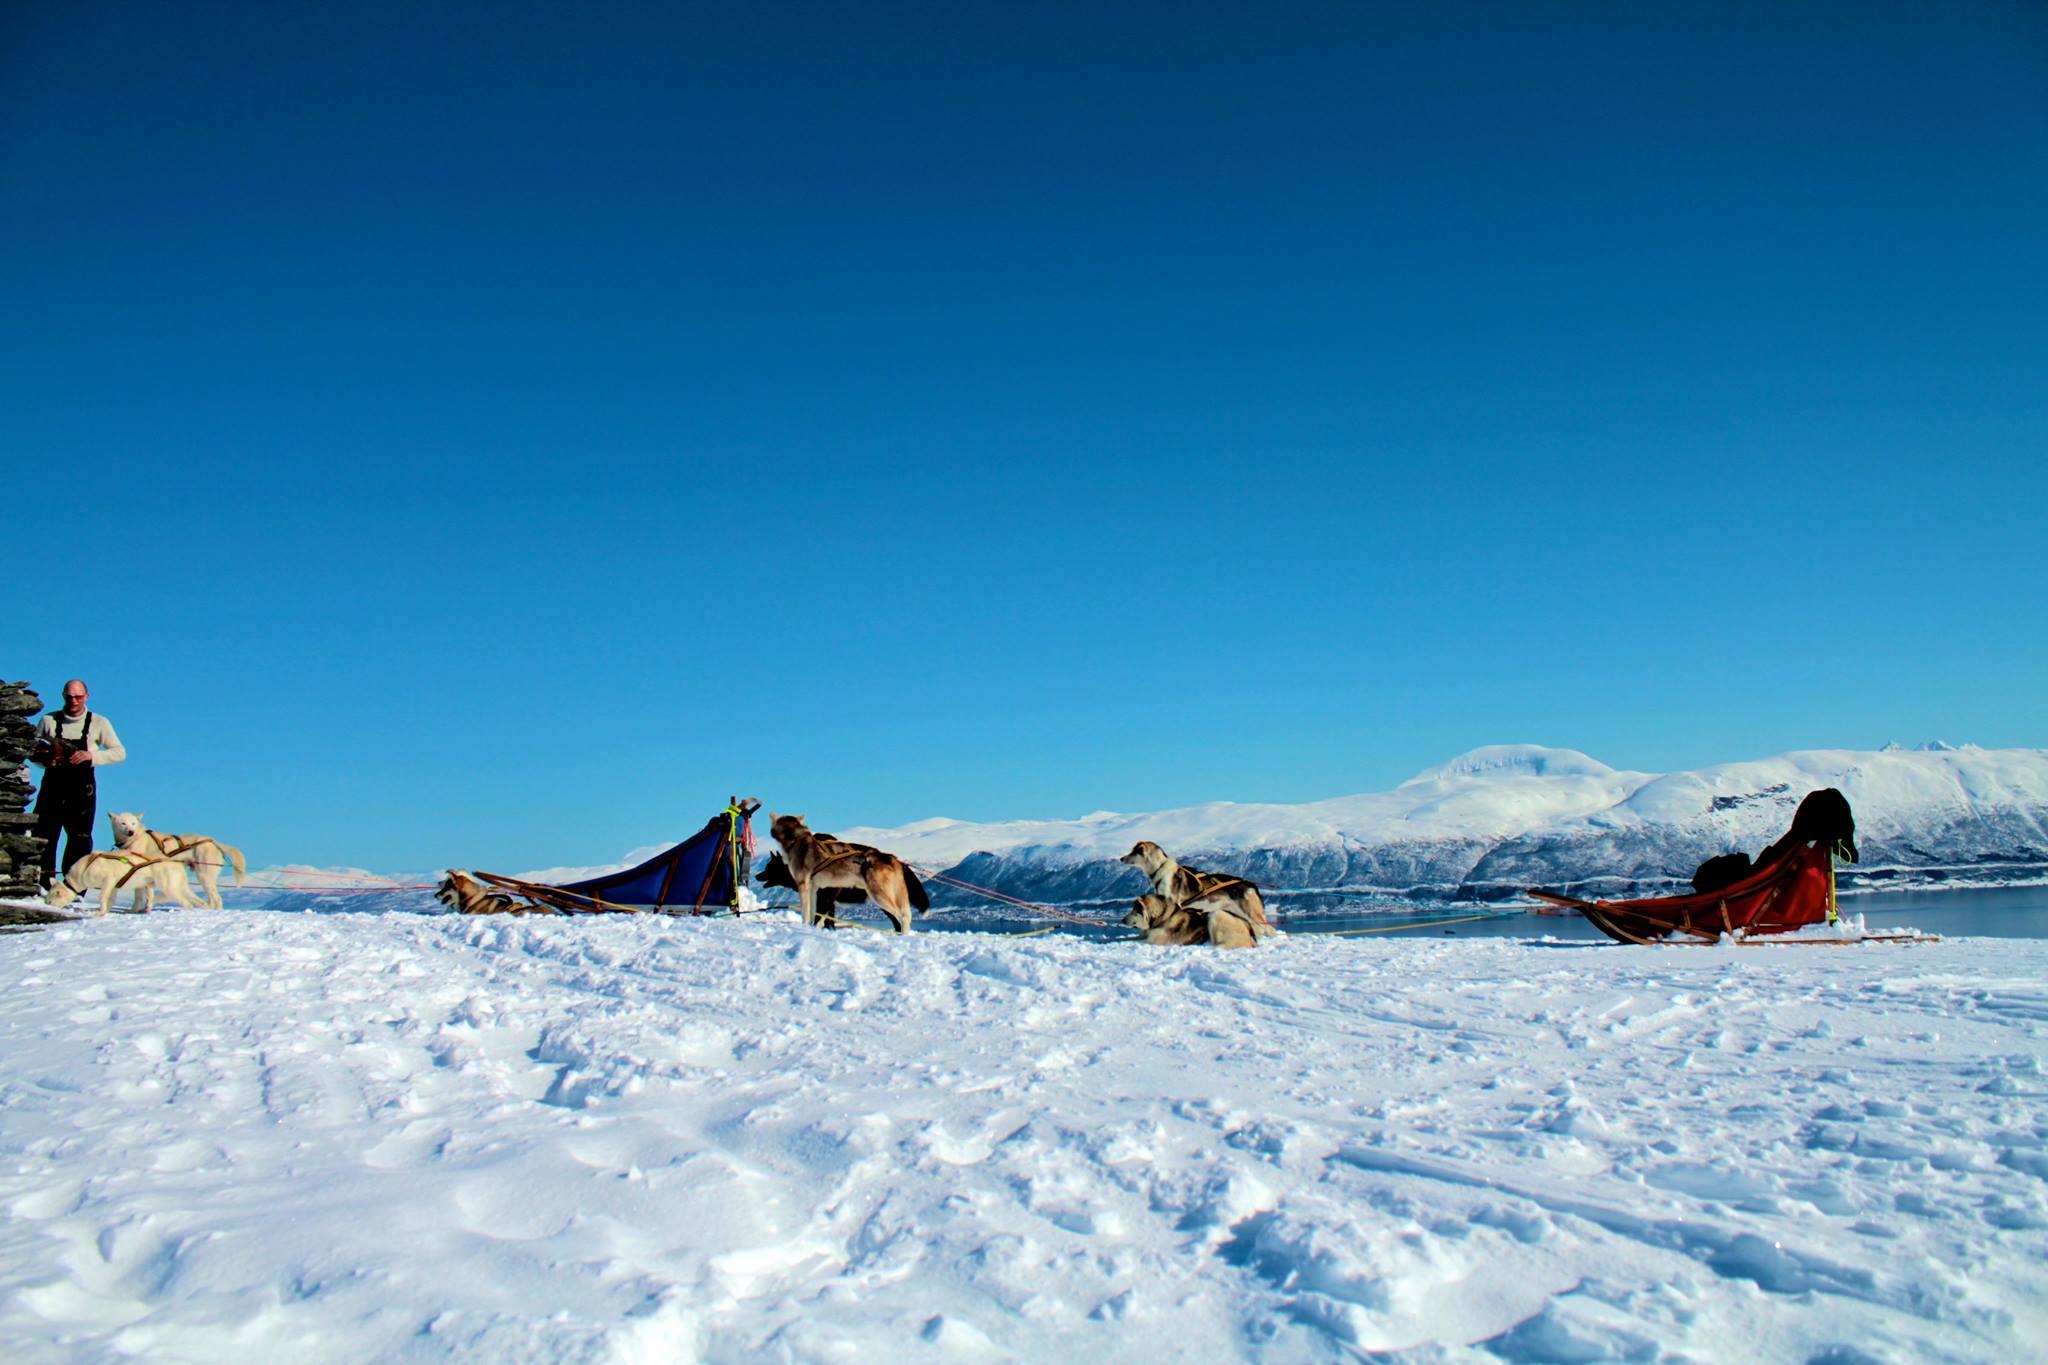 Dog sledding Arctic Cruie In Norway 2.jpg